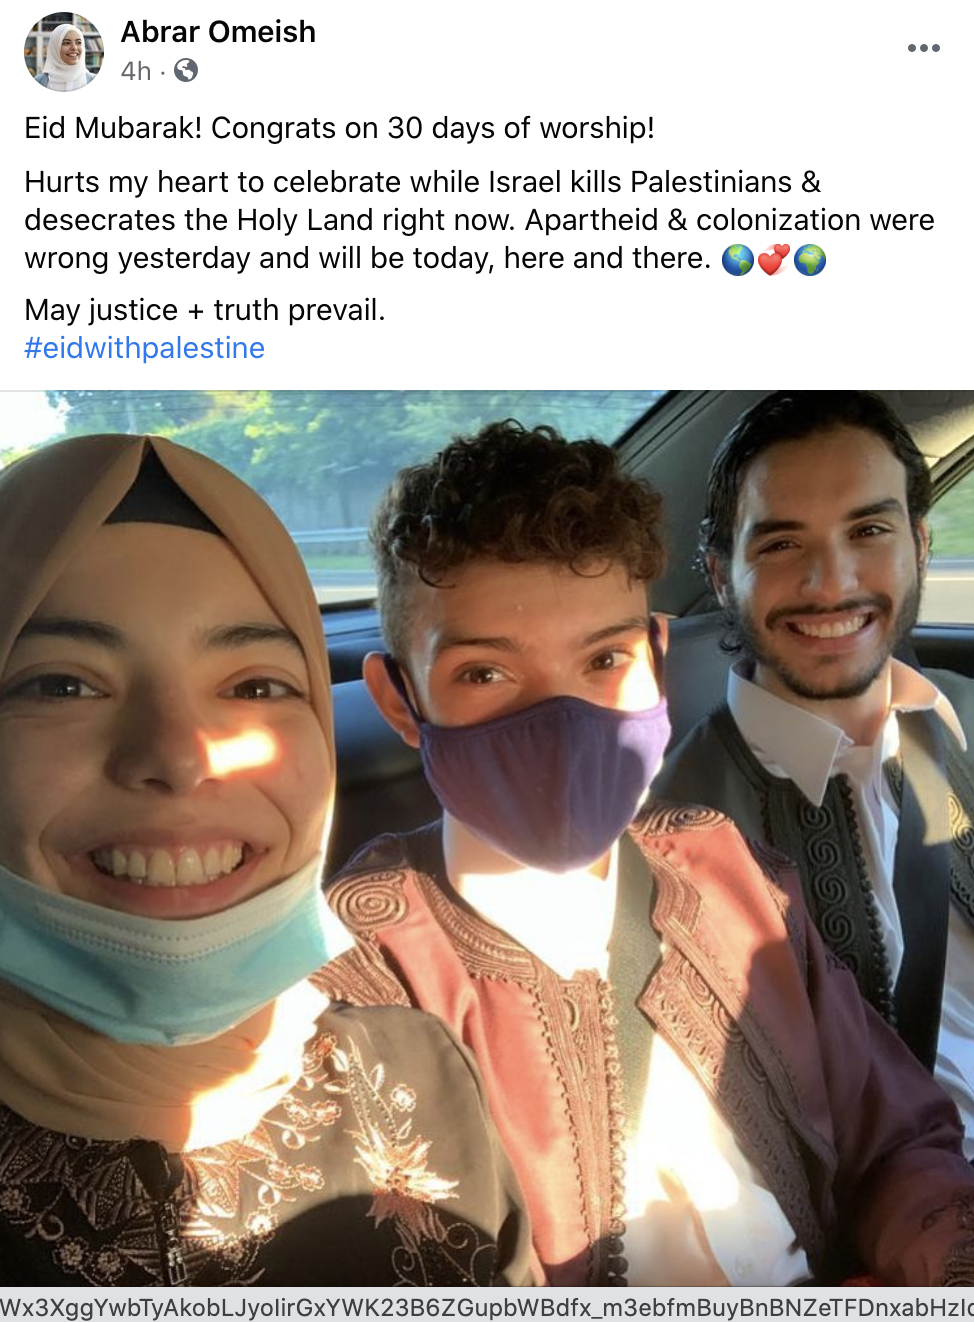 Virginia School Board Member Makes Anti-Israel Social Media Posts 2